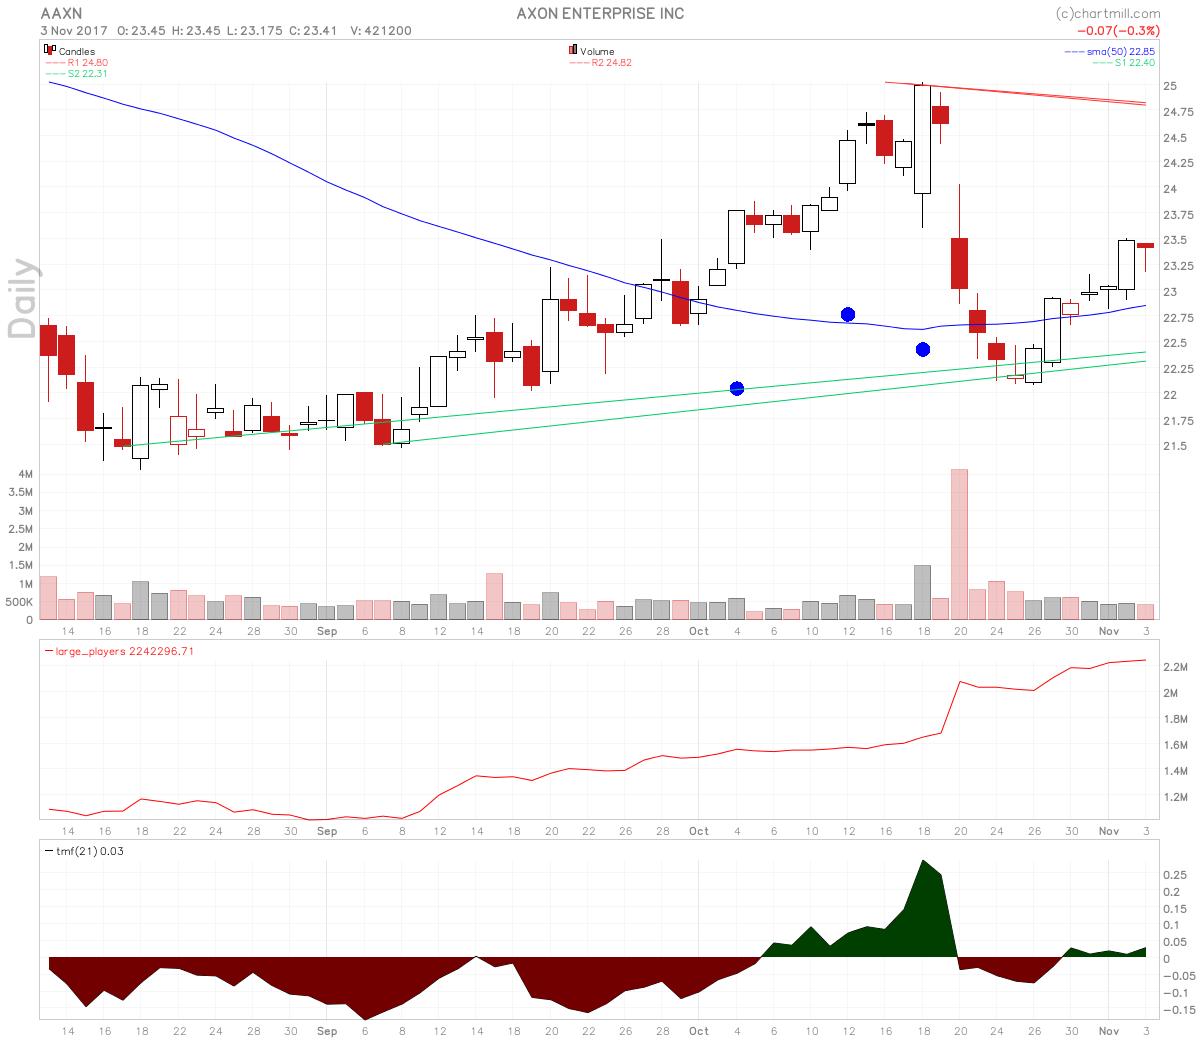 Axon Enterprise stock has rising large players volume.